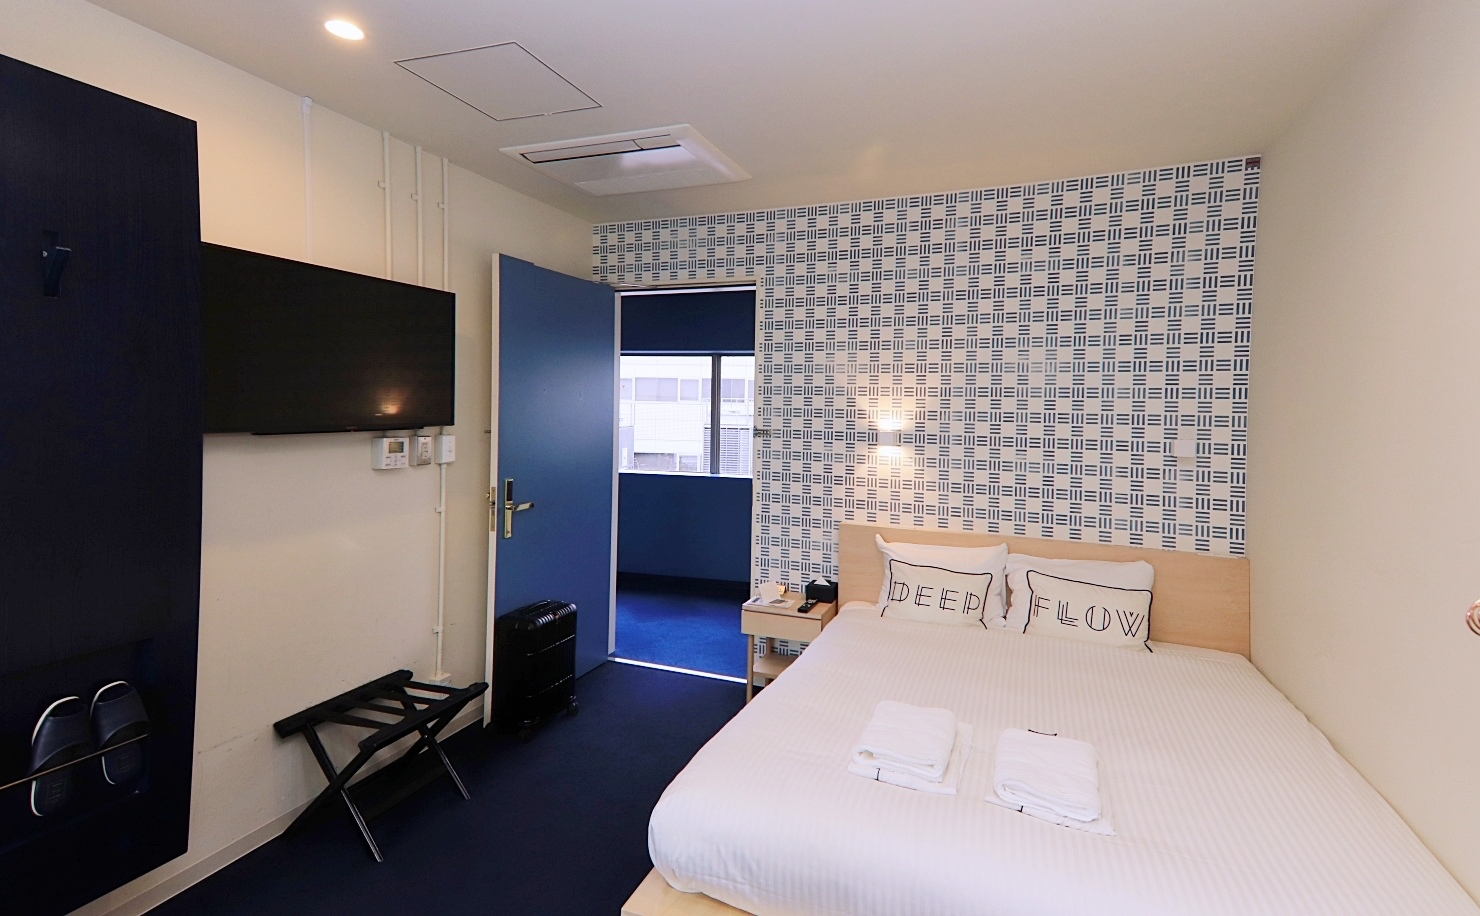 The Share Hotels Lyuro